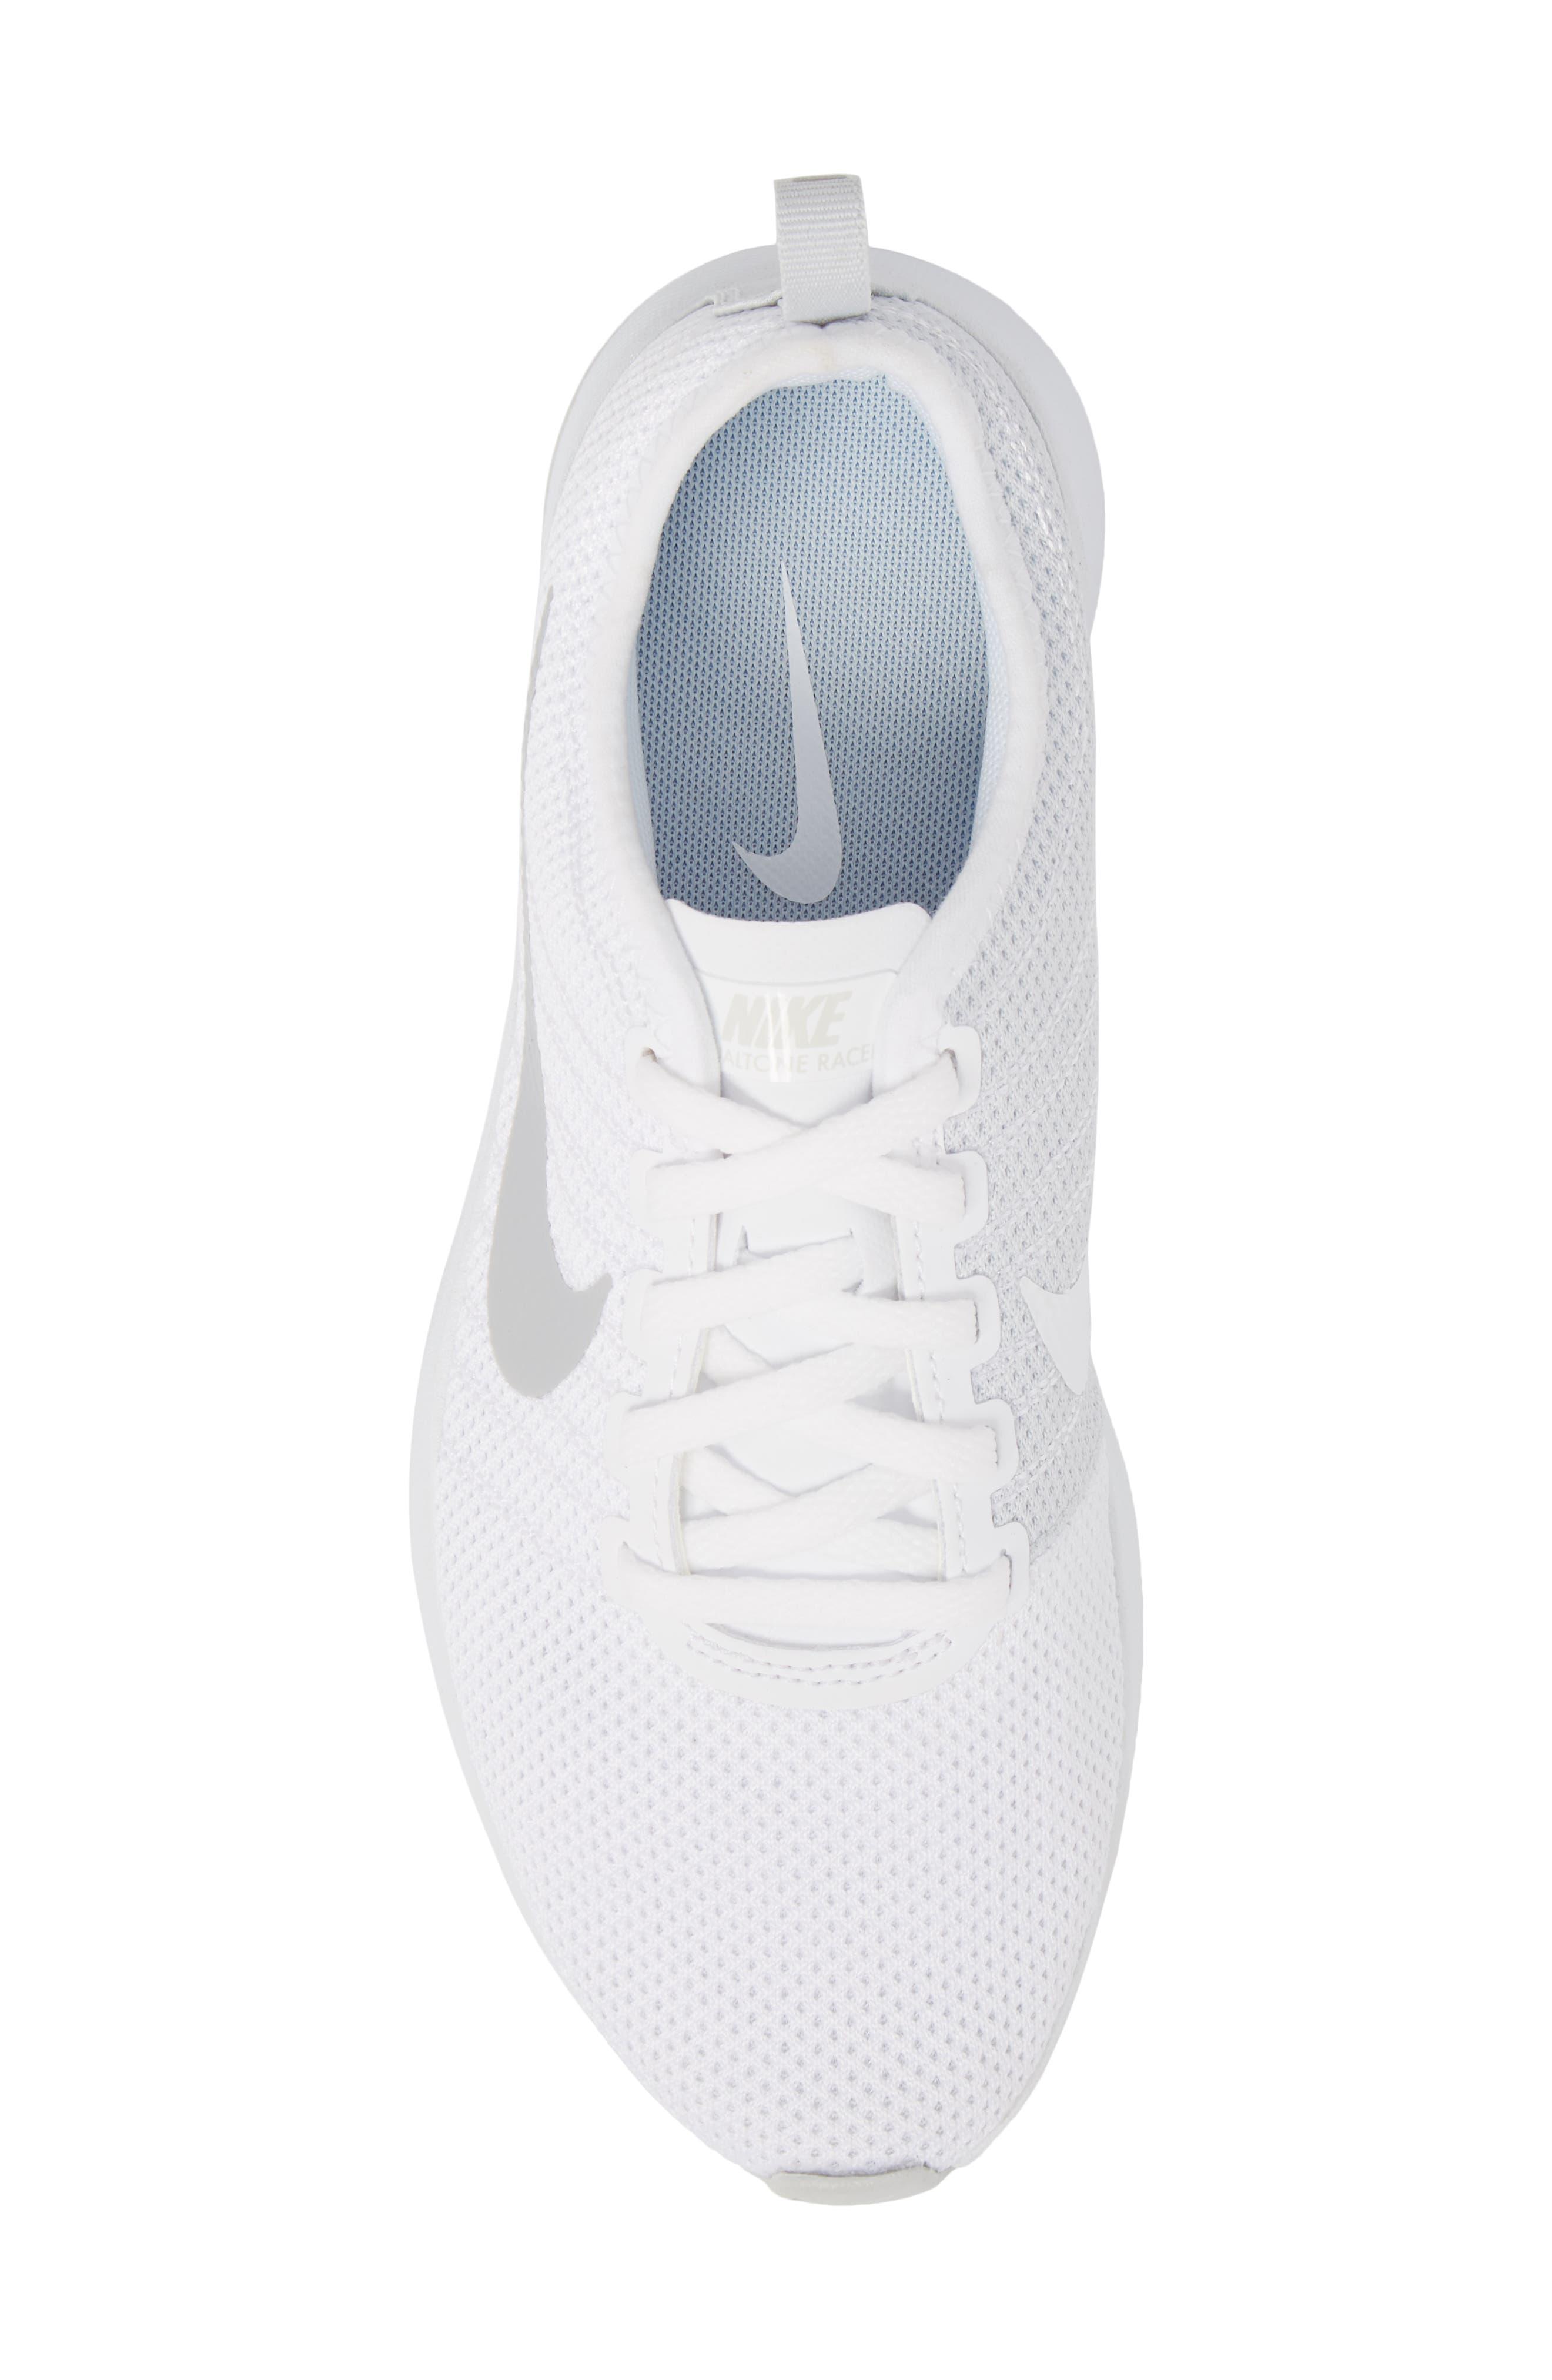 Dualtone Racer Running Shoe,                             Alternate thumbnail 5, color,                             White/ Pure Platinum